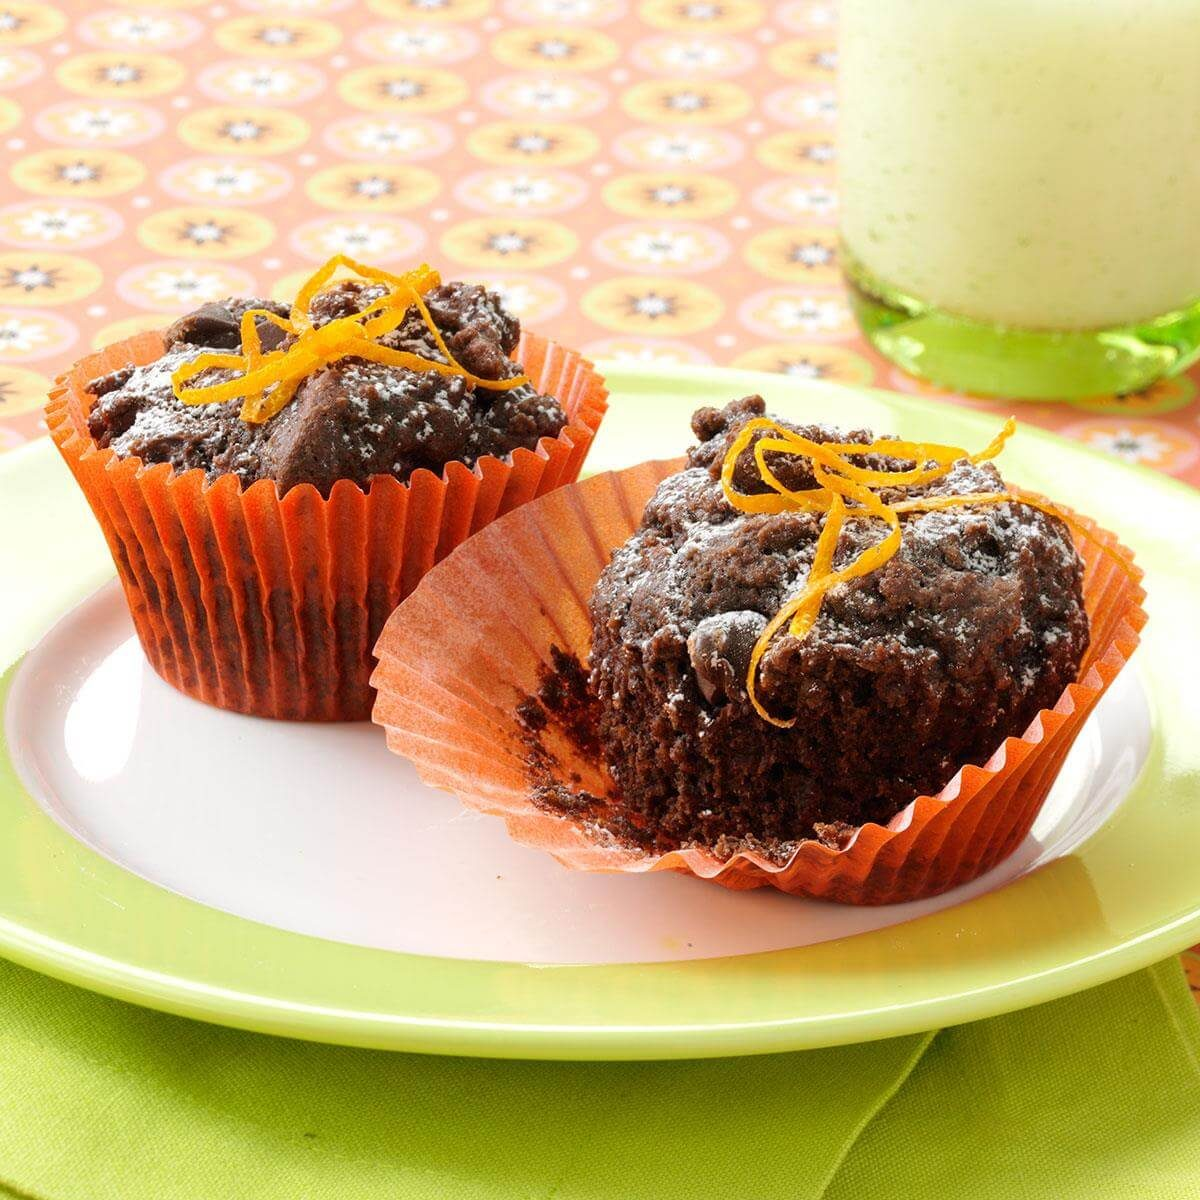 Chocolate Orange Cupcakes Recipe | Taste of Home